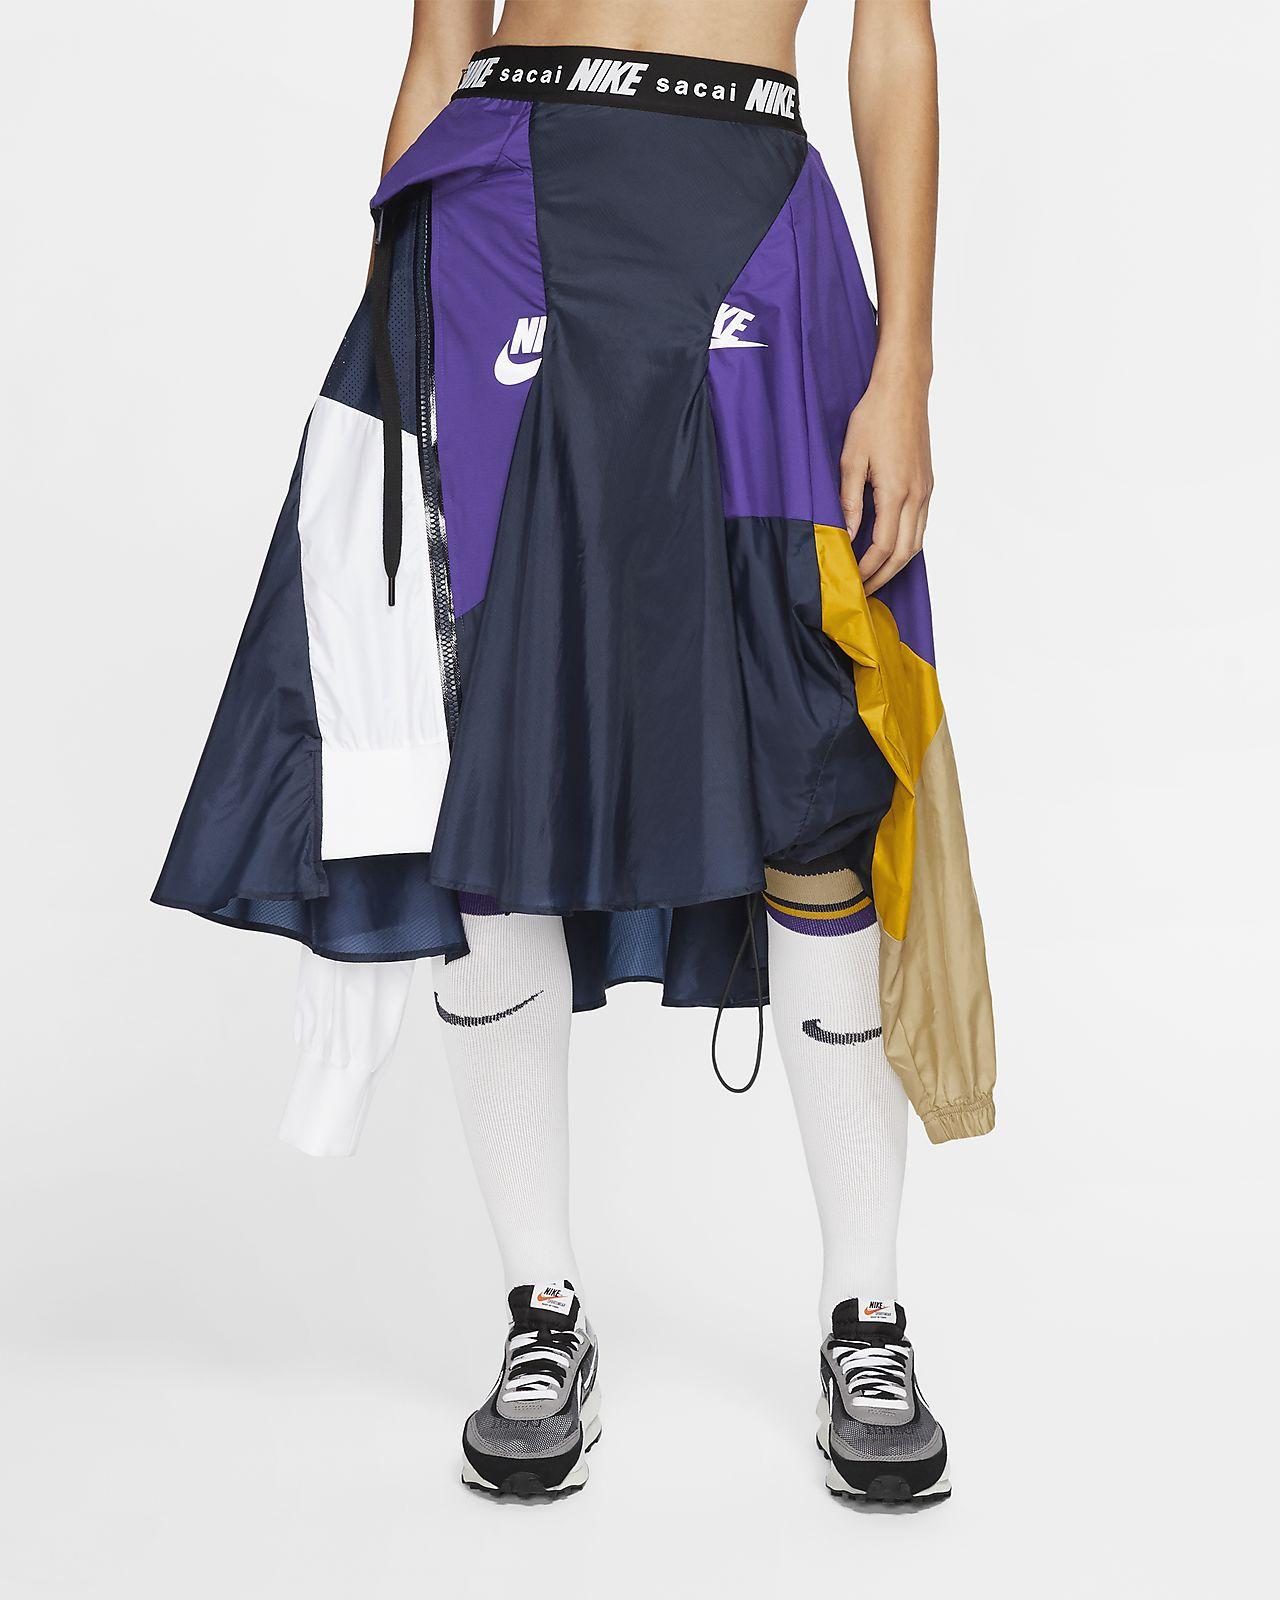 Nike x Sacai 女子短裙